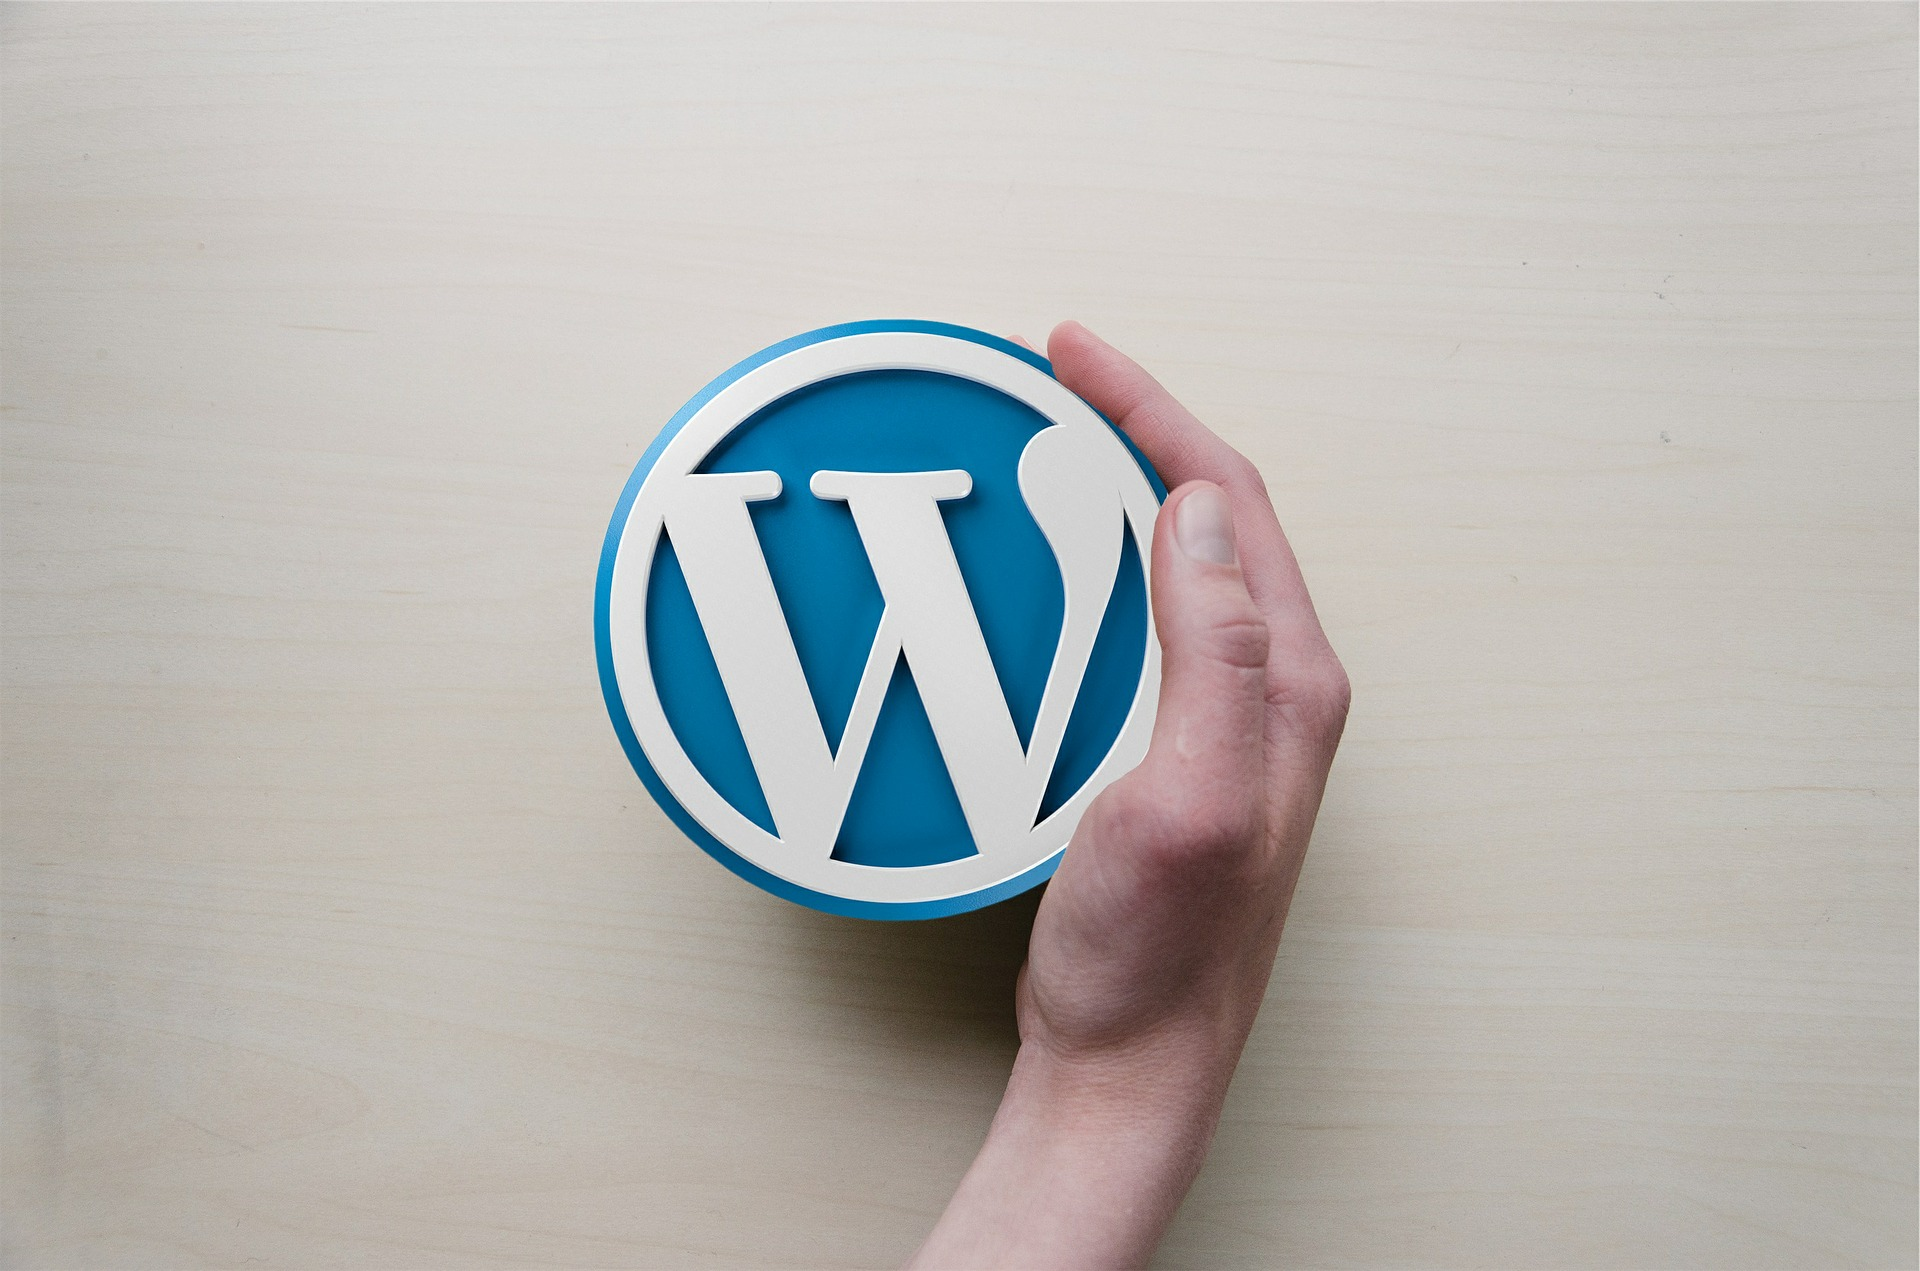 wordpress 2 - WordPressのサーバー移行方法とおすすめレンタルサーバー